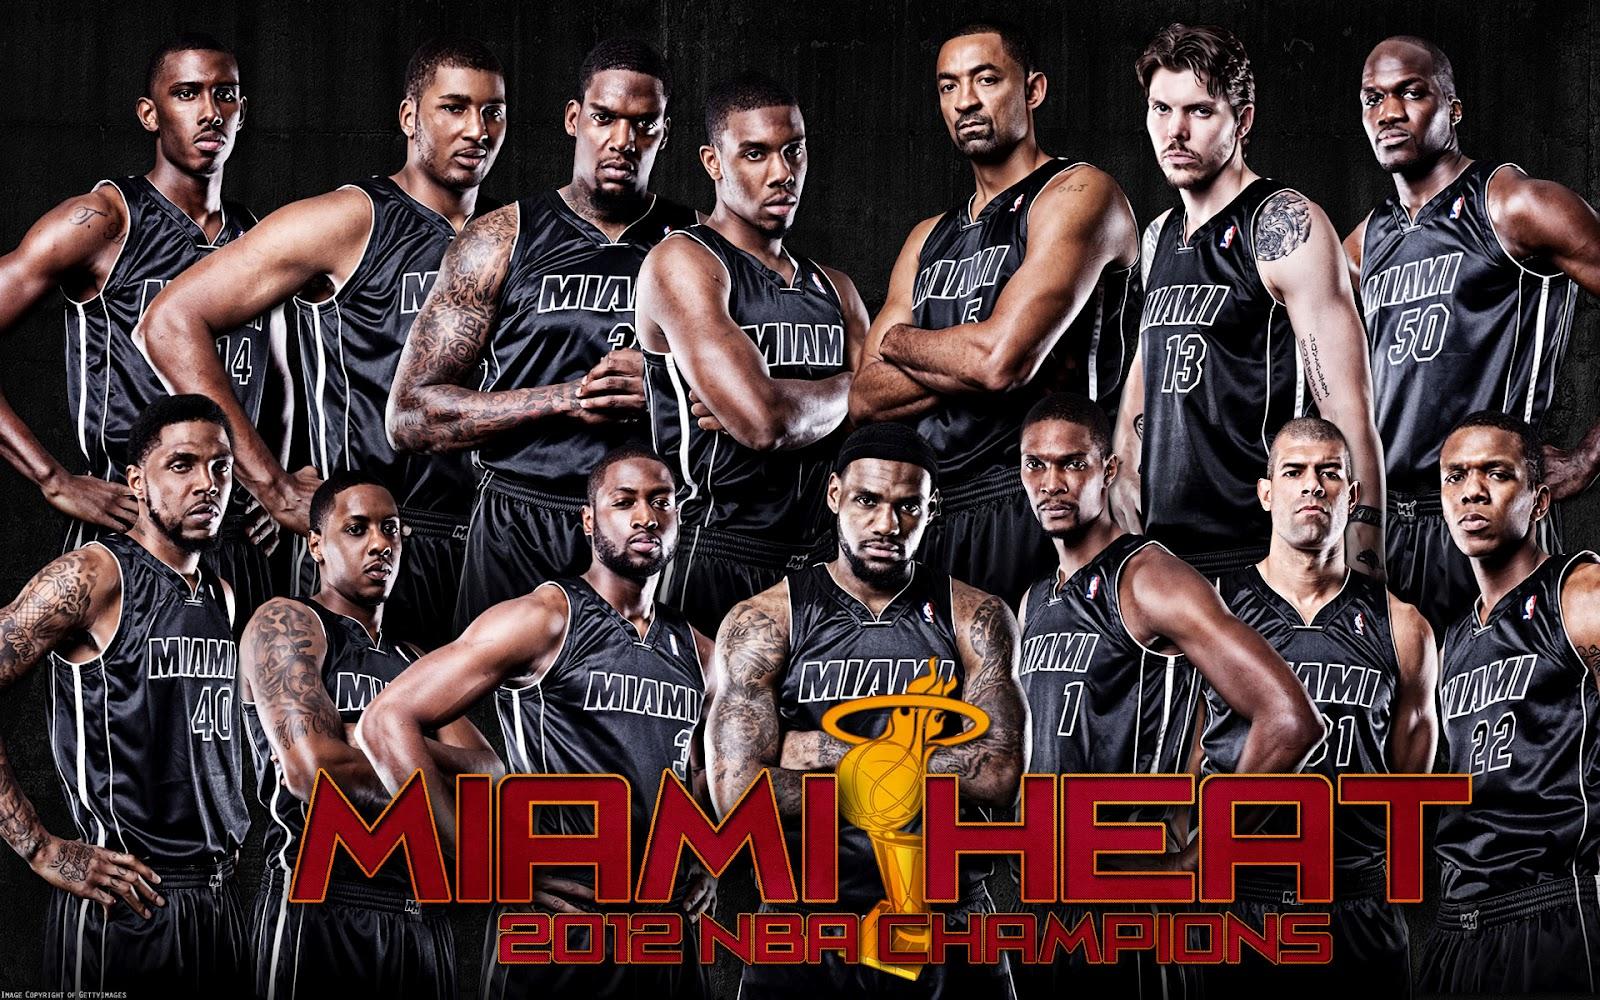 Nba Basketball Miami Heat Bedroom In: Miami Heat Basketball Club Players HD Wallpapers 2013